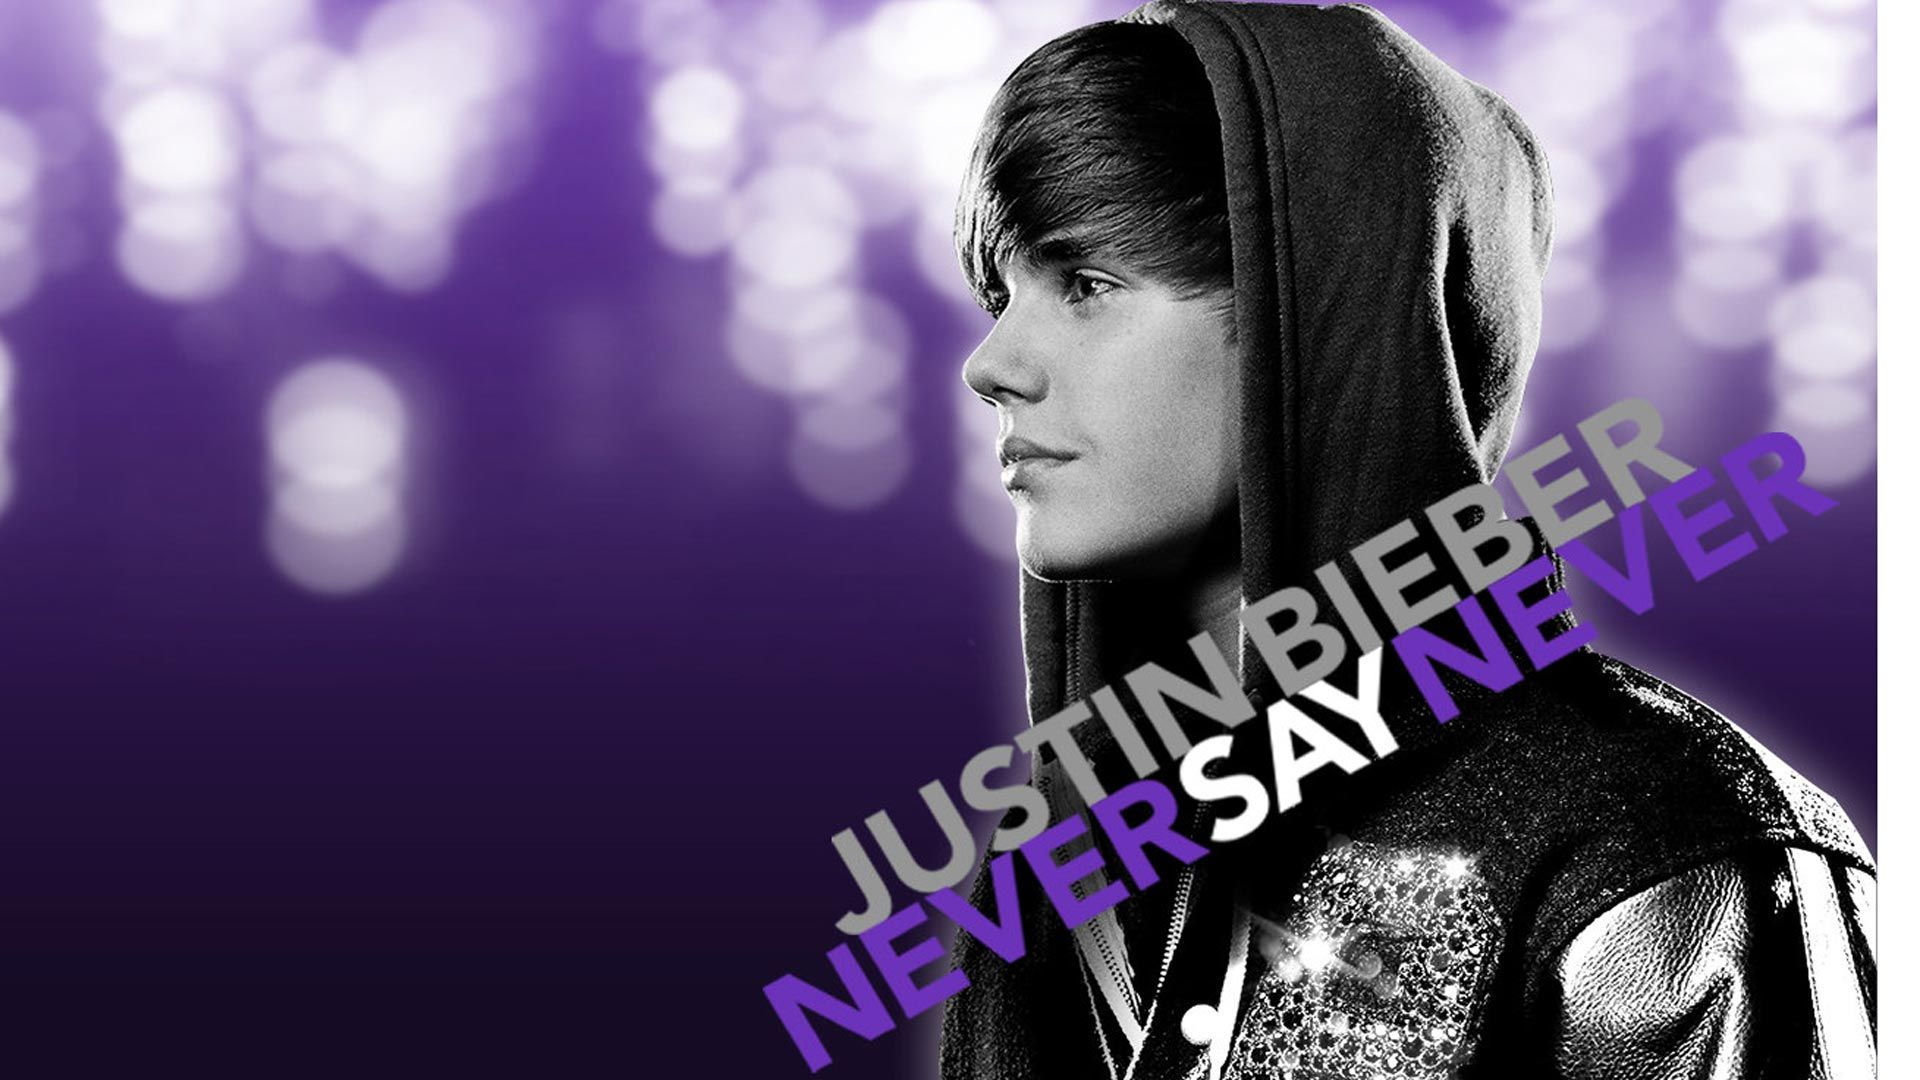 Justin Bieber Wallpaper Hd Http Www 4gwallpapers Com Wp Content Uploads 2017 01 Justin Bi Justin Bieber Wallpaper Justin Bieber Images Justin Bieber News